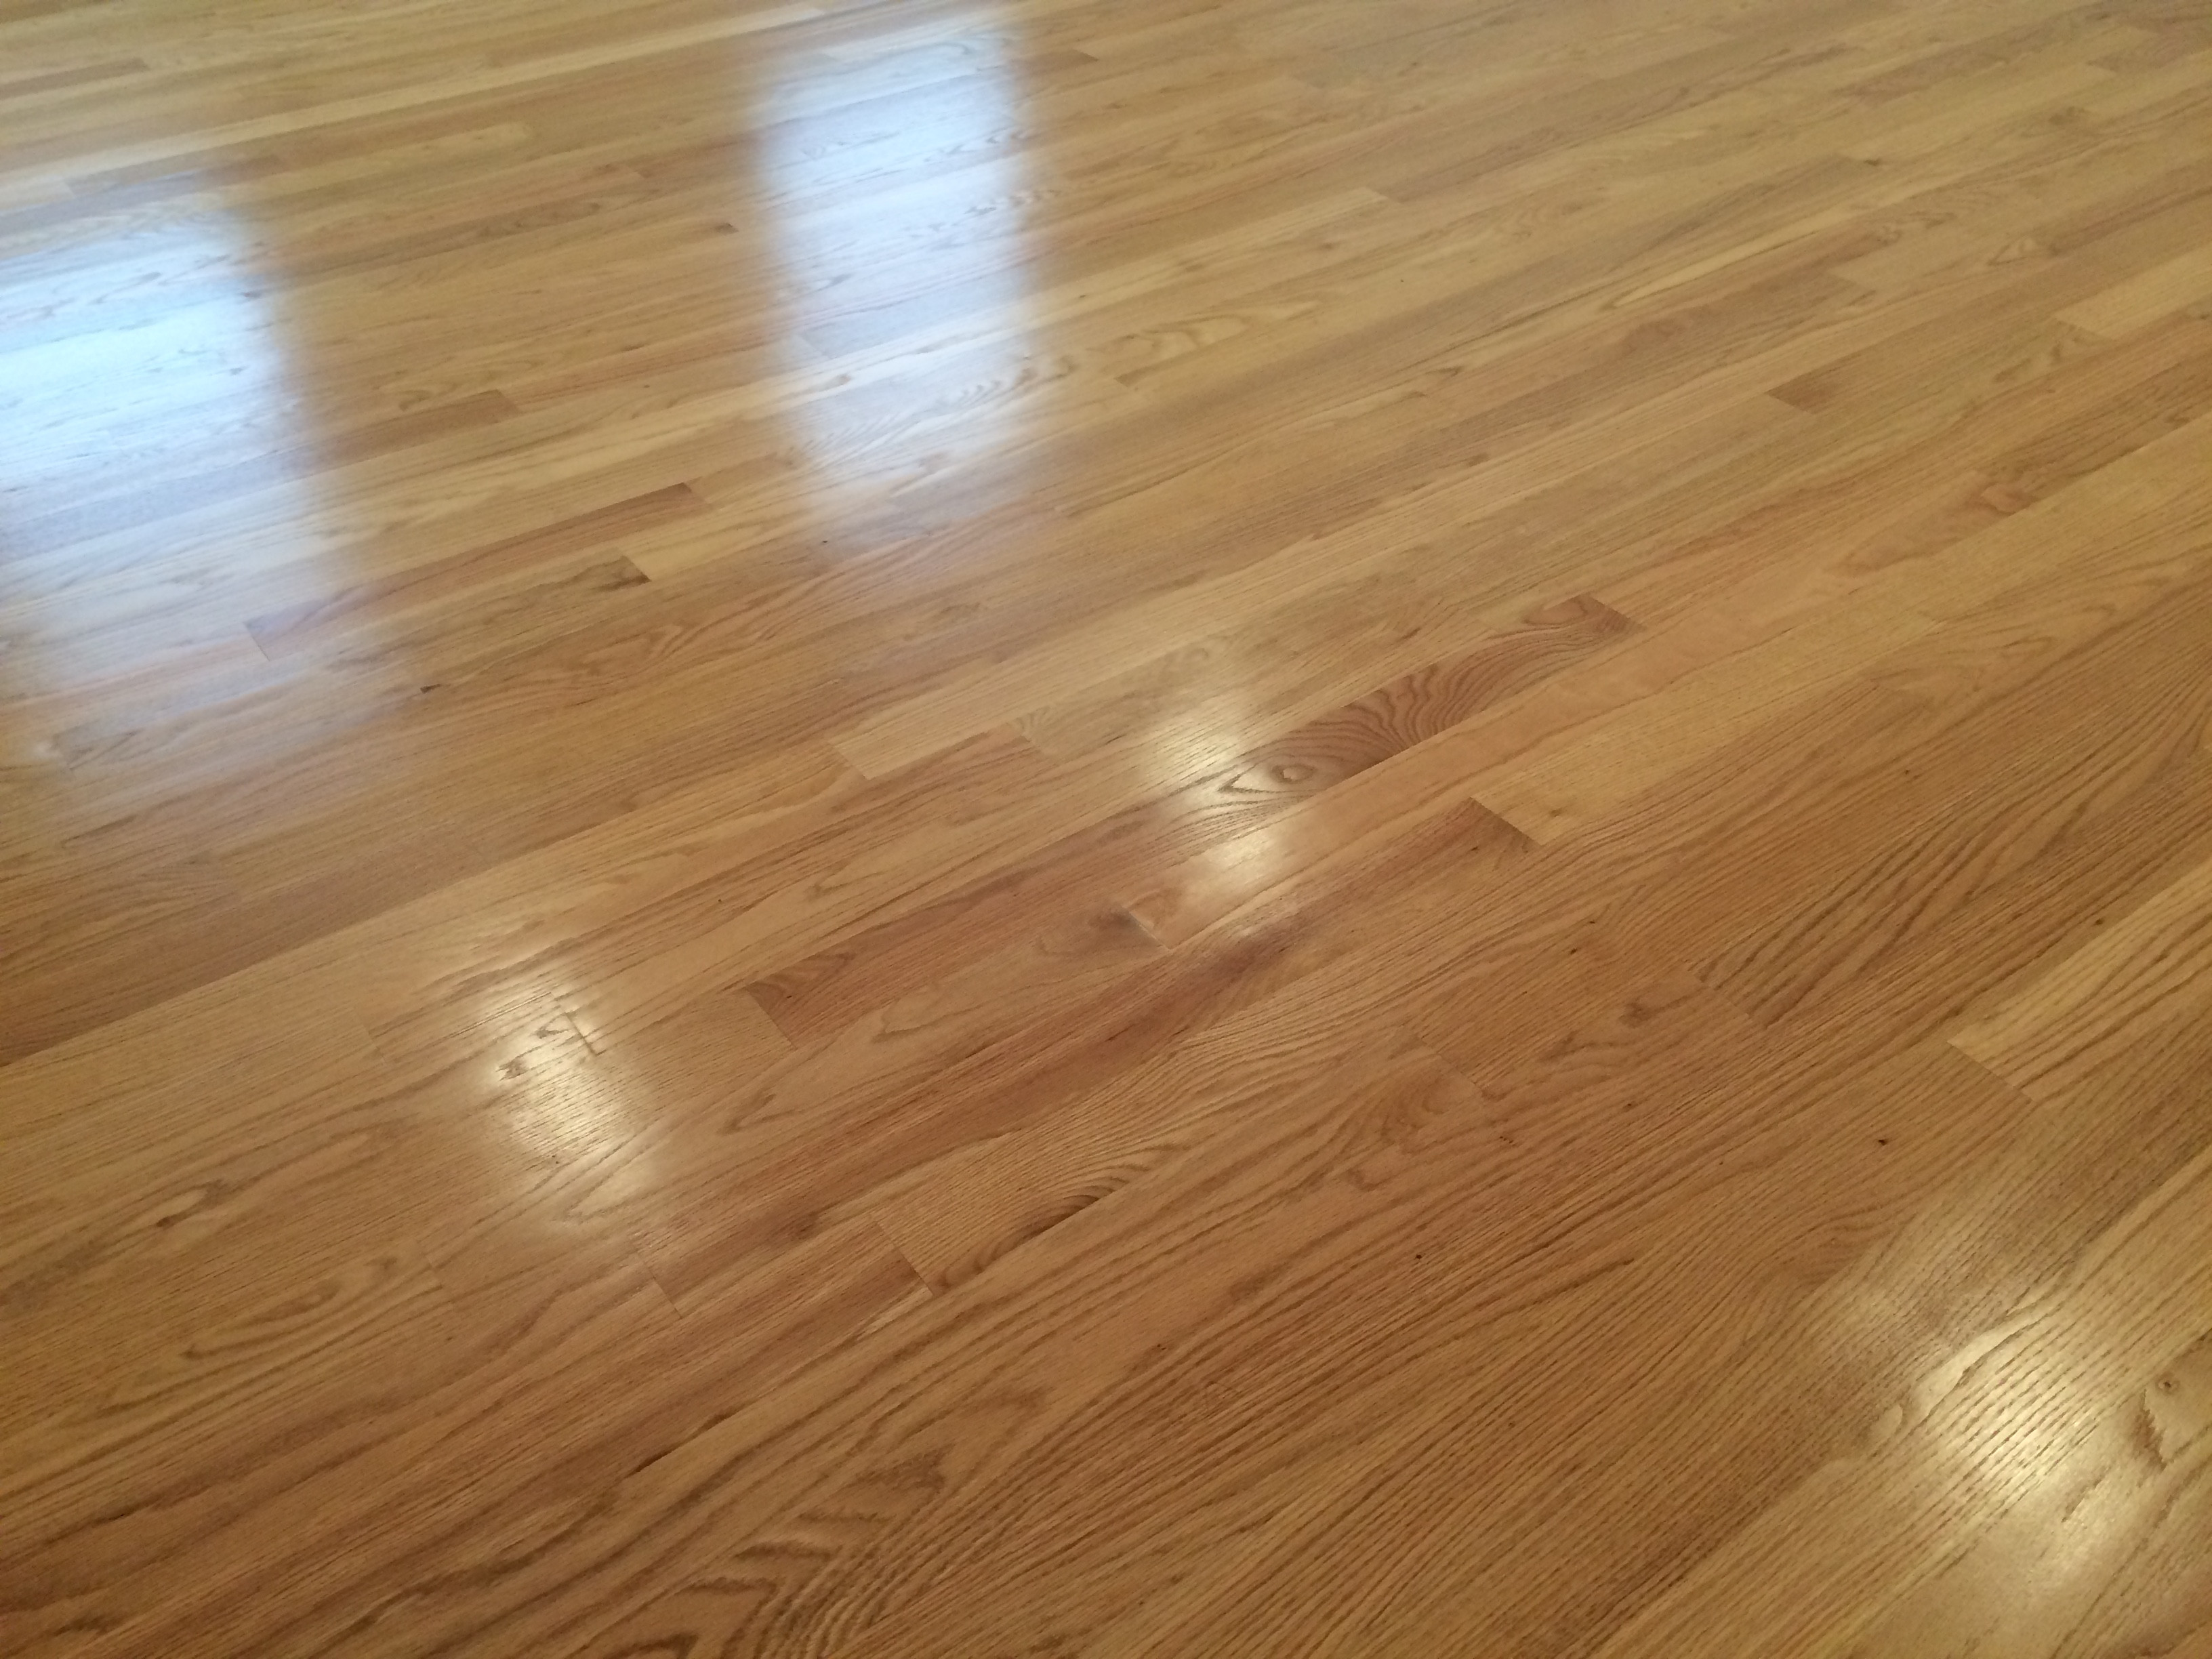 Hardwood Floor Refinishing Monmouth County Nj Of Flooring Portfolio Gorsegner Brothers with Regard to Img 0845